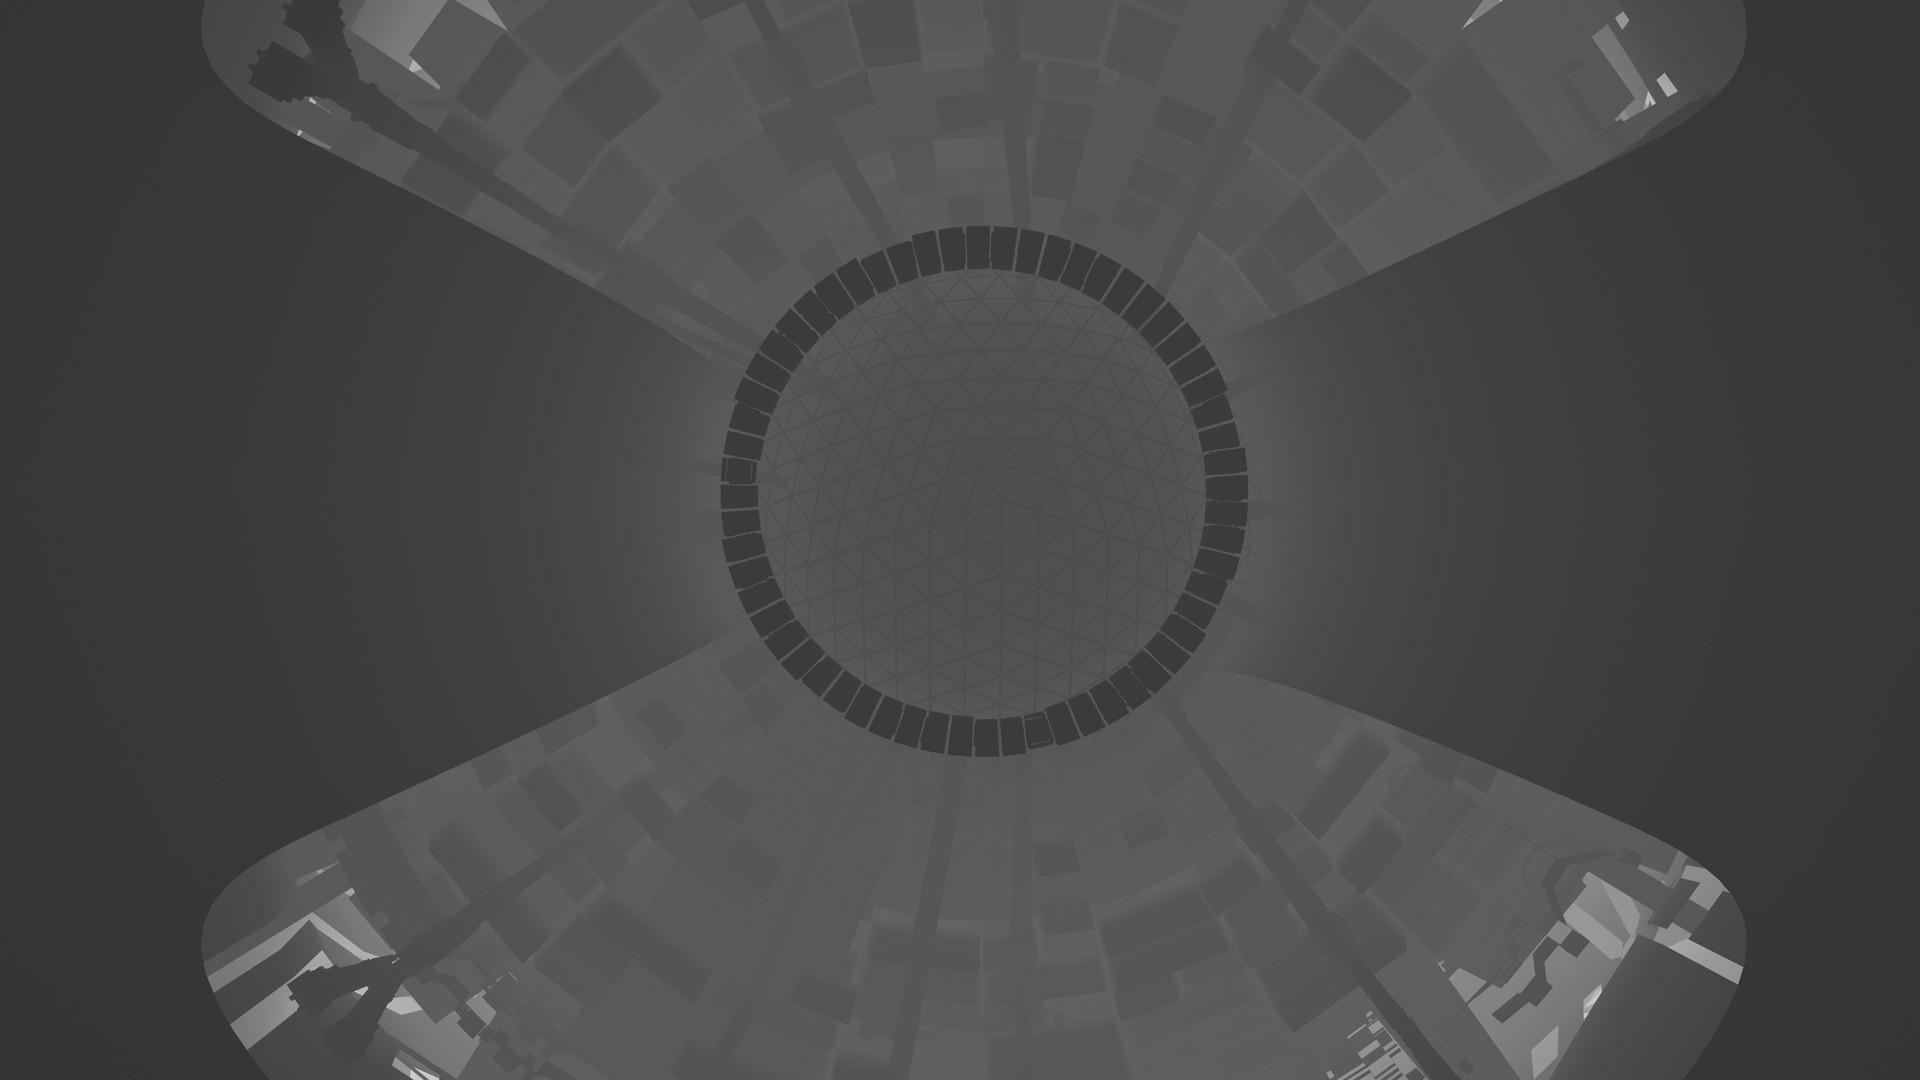 Kresimir jelusic robob3ar 433 201216 core zdepth